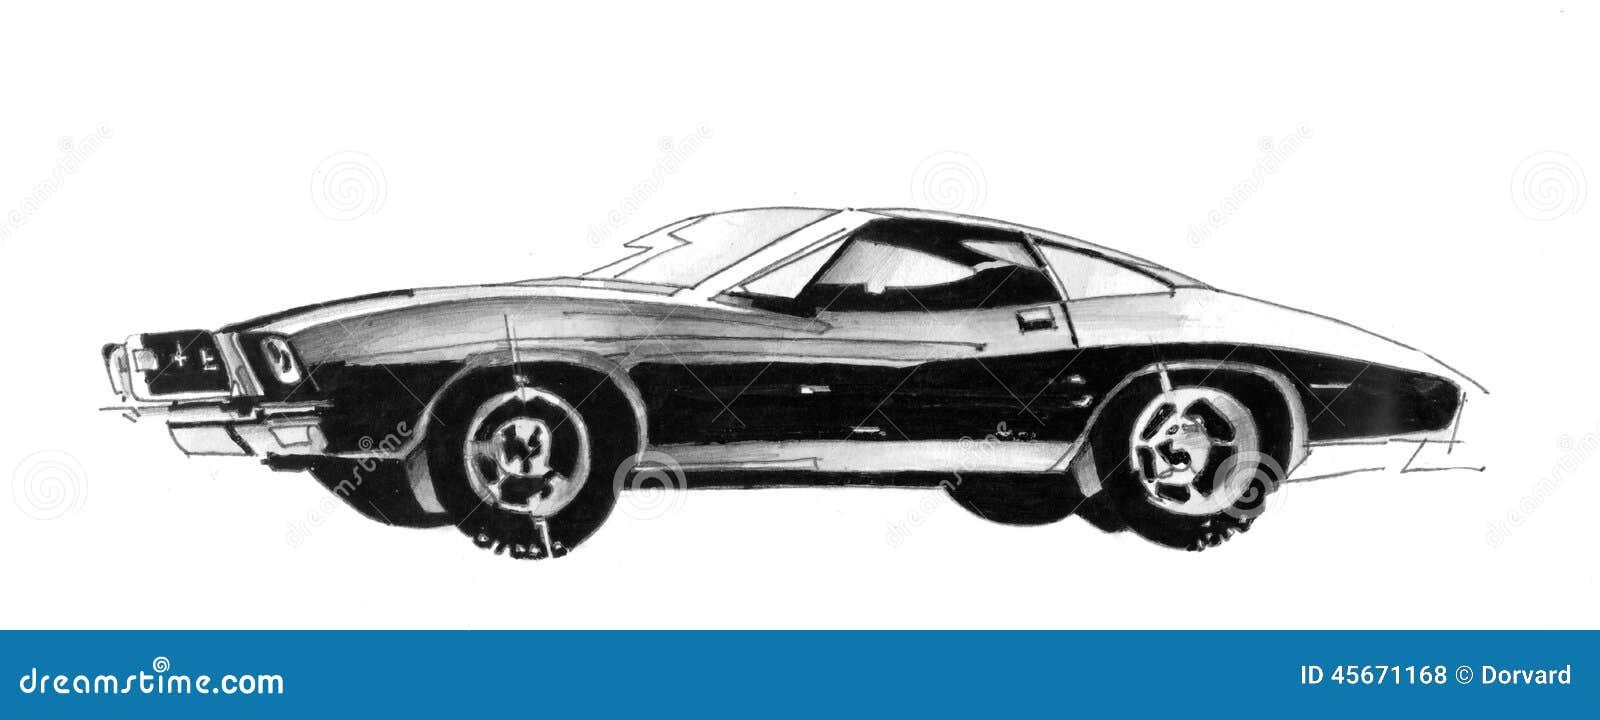 Retro Sport Car Drawing Illustration 45671168 Megapixl